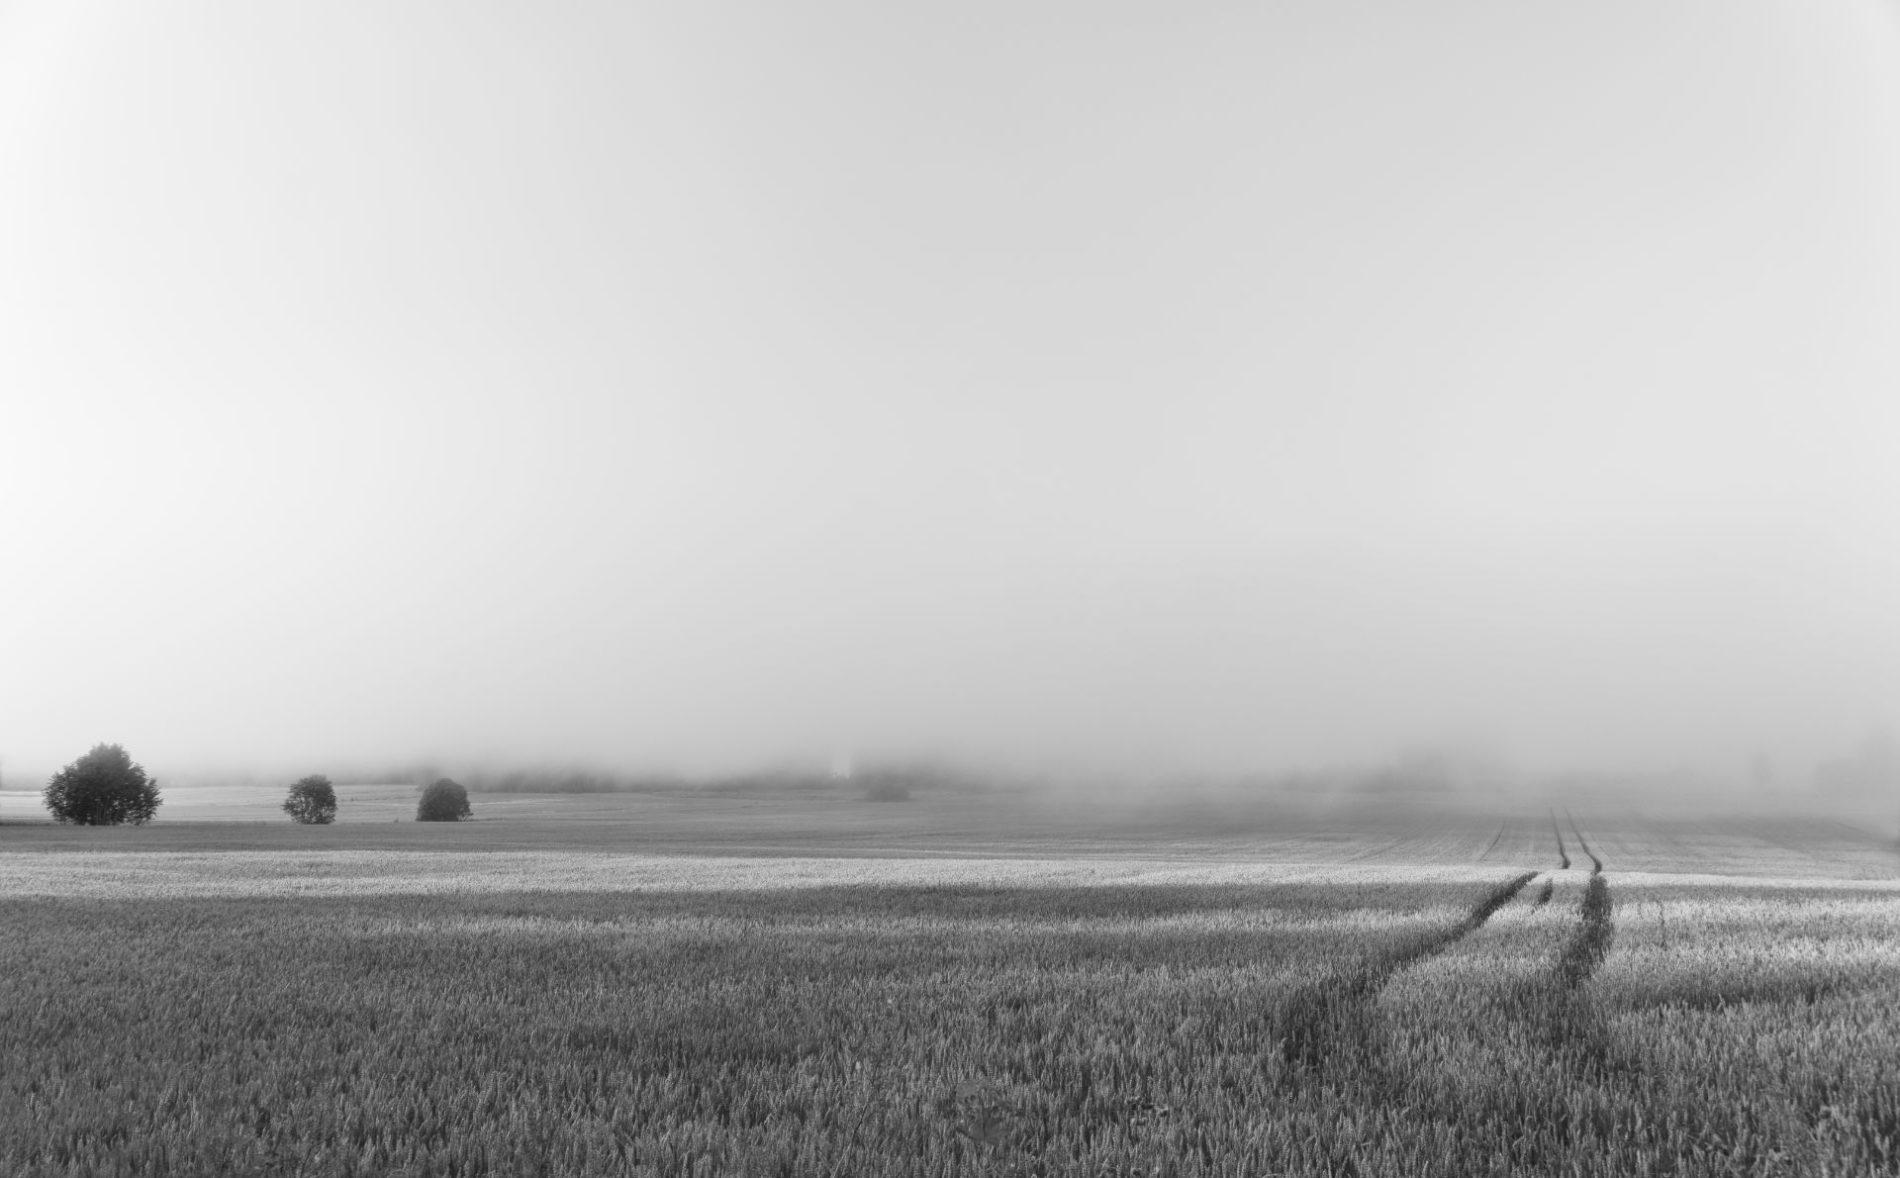 Landscape with fog